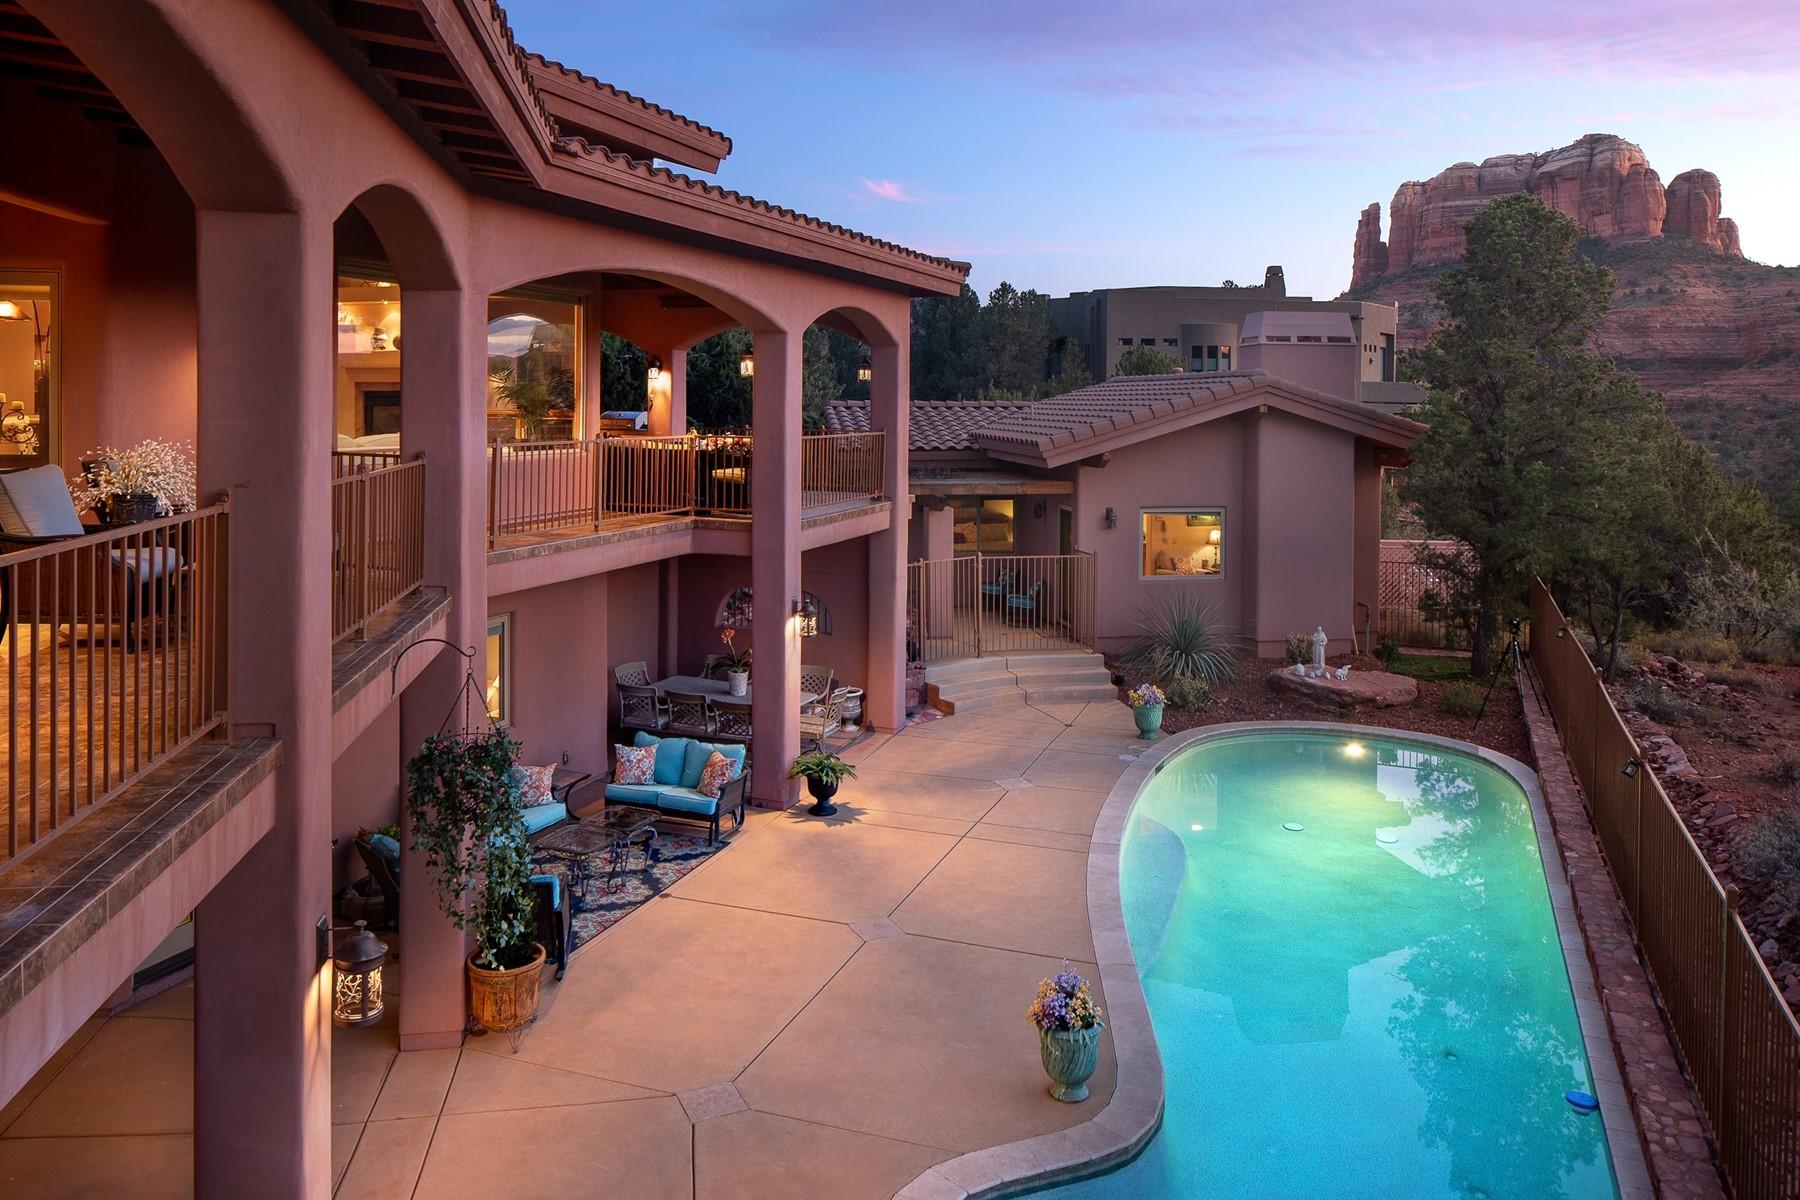 Single Family Homes for Active at Back O Beyond Ranch 225 Scenic Drive Sedona, Arizona 86336 United States